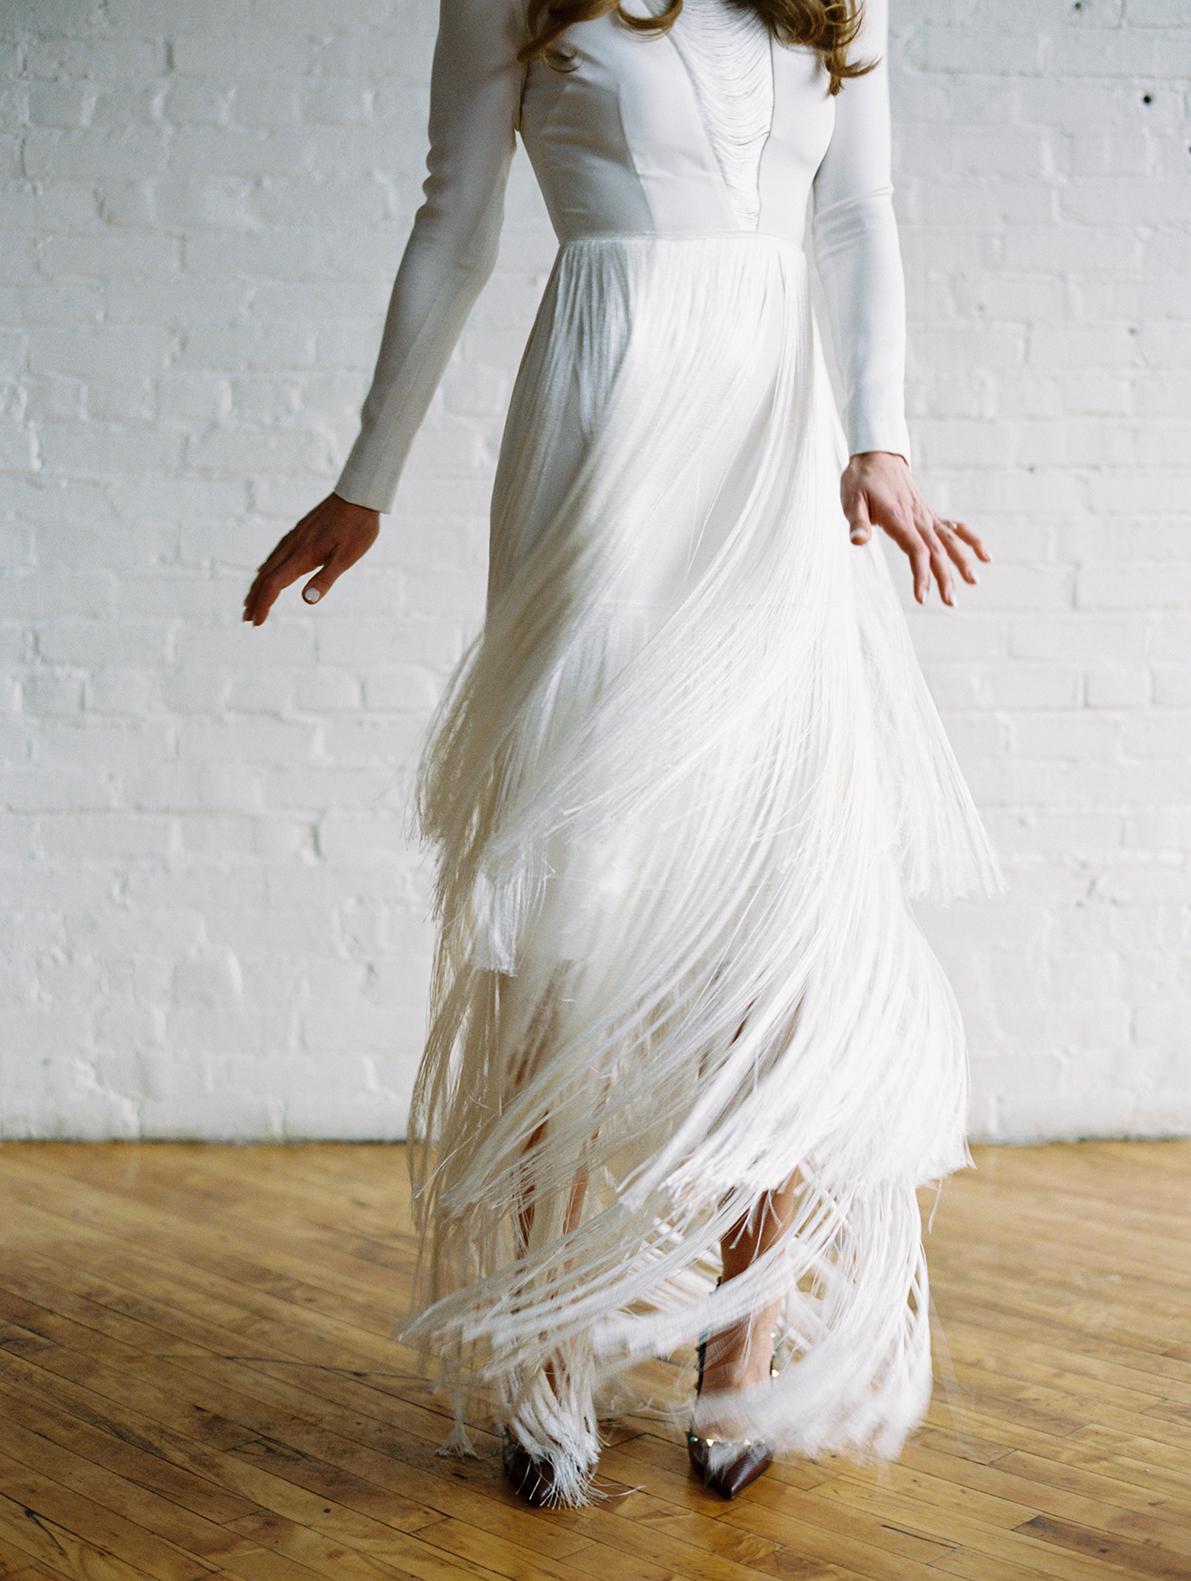 joanna jay wedding bride gown fringe